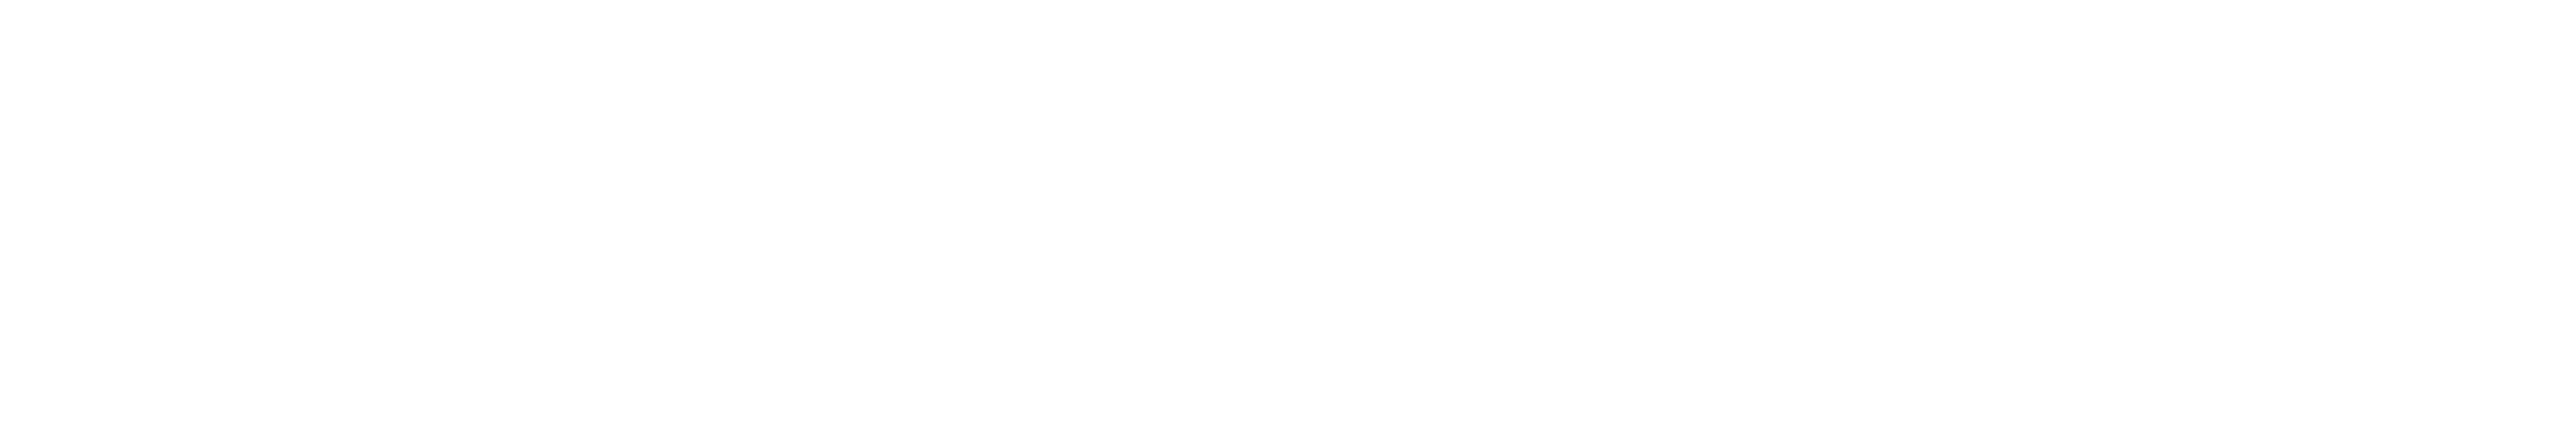 medipense-logo-white